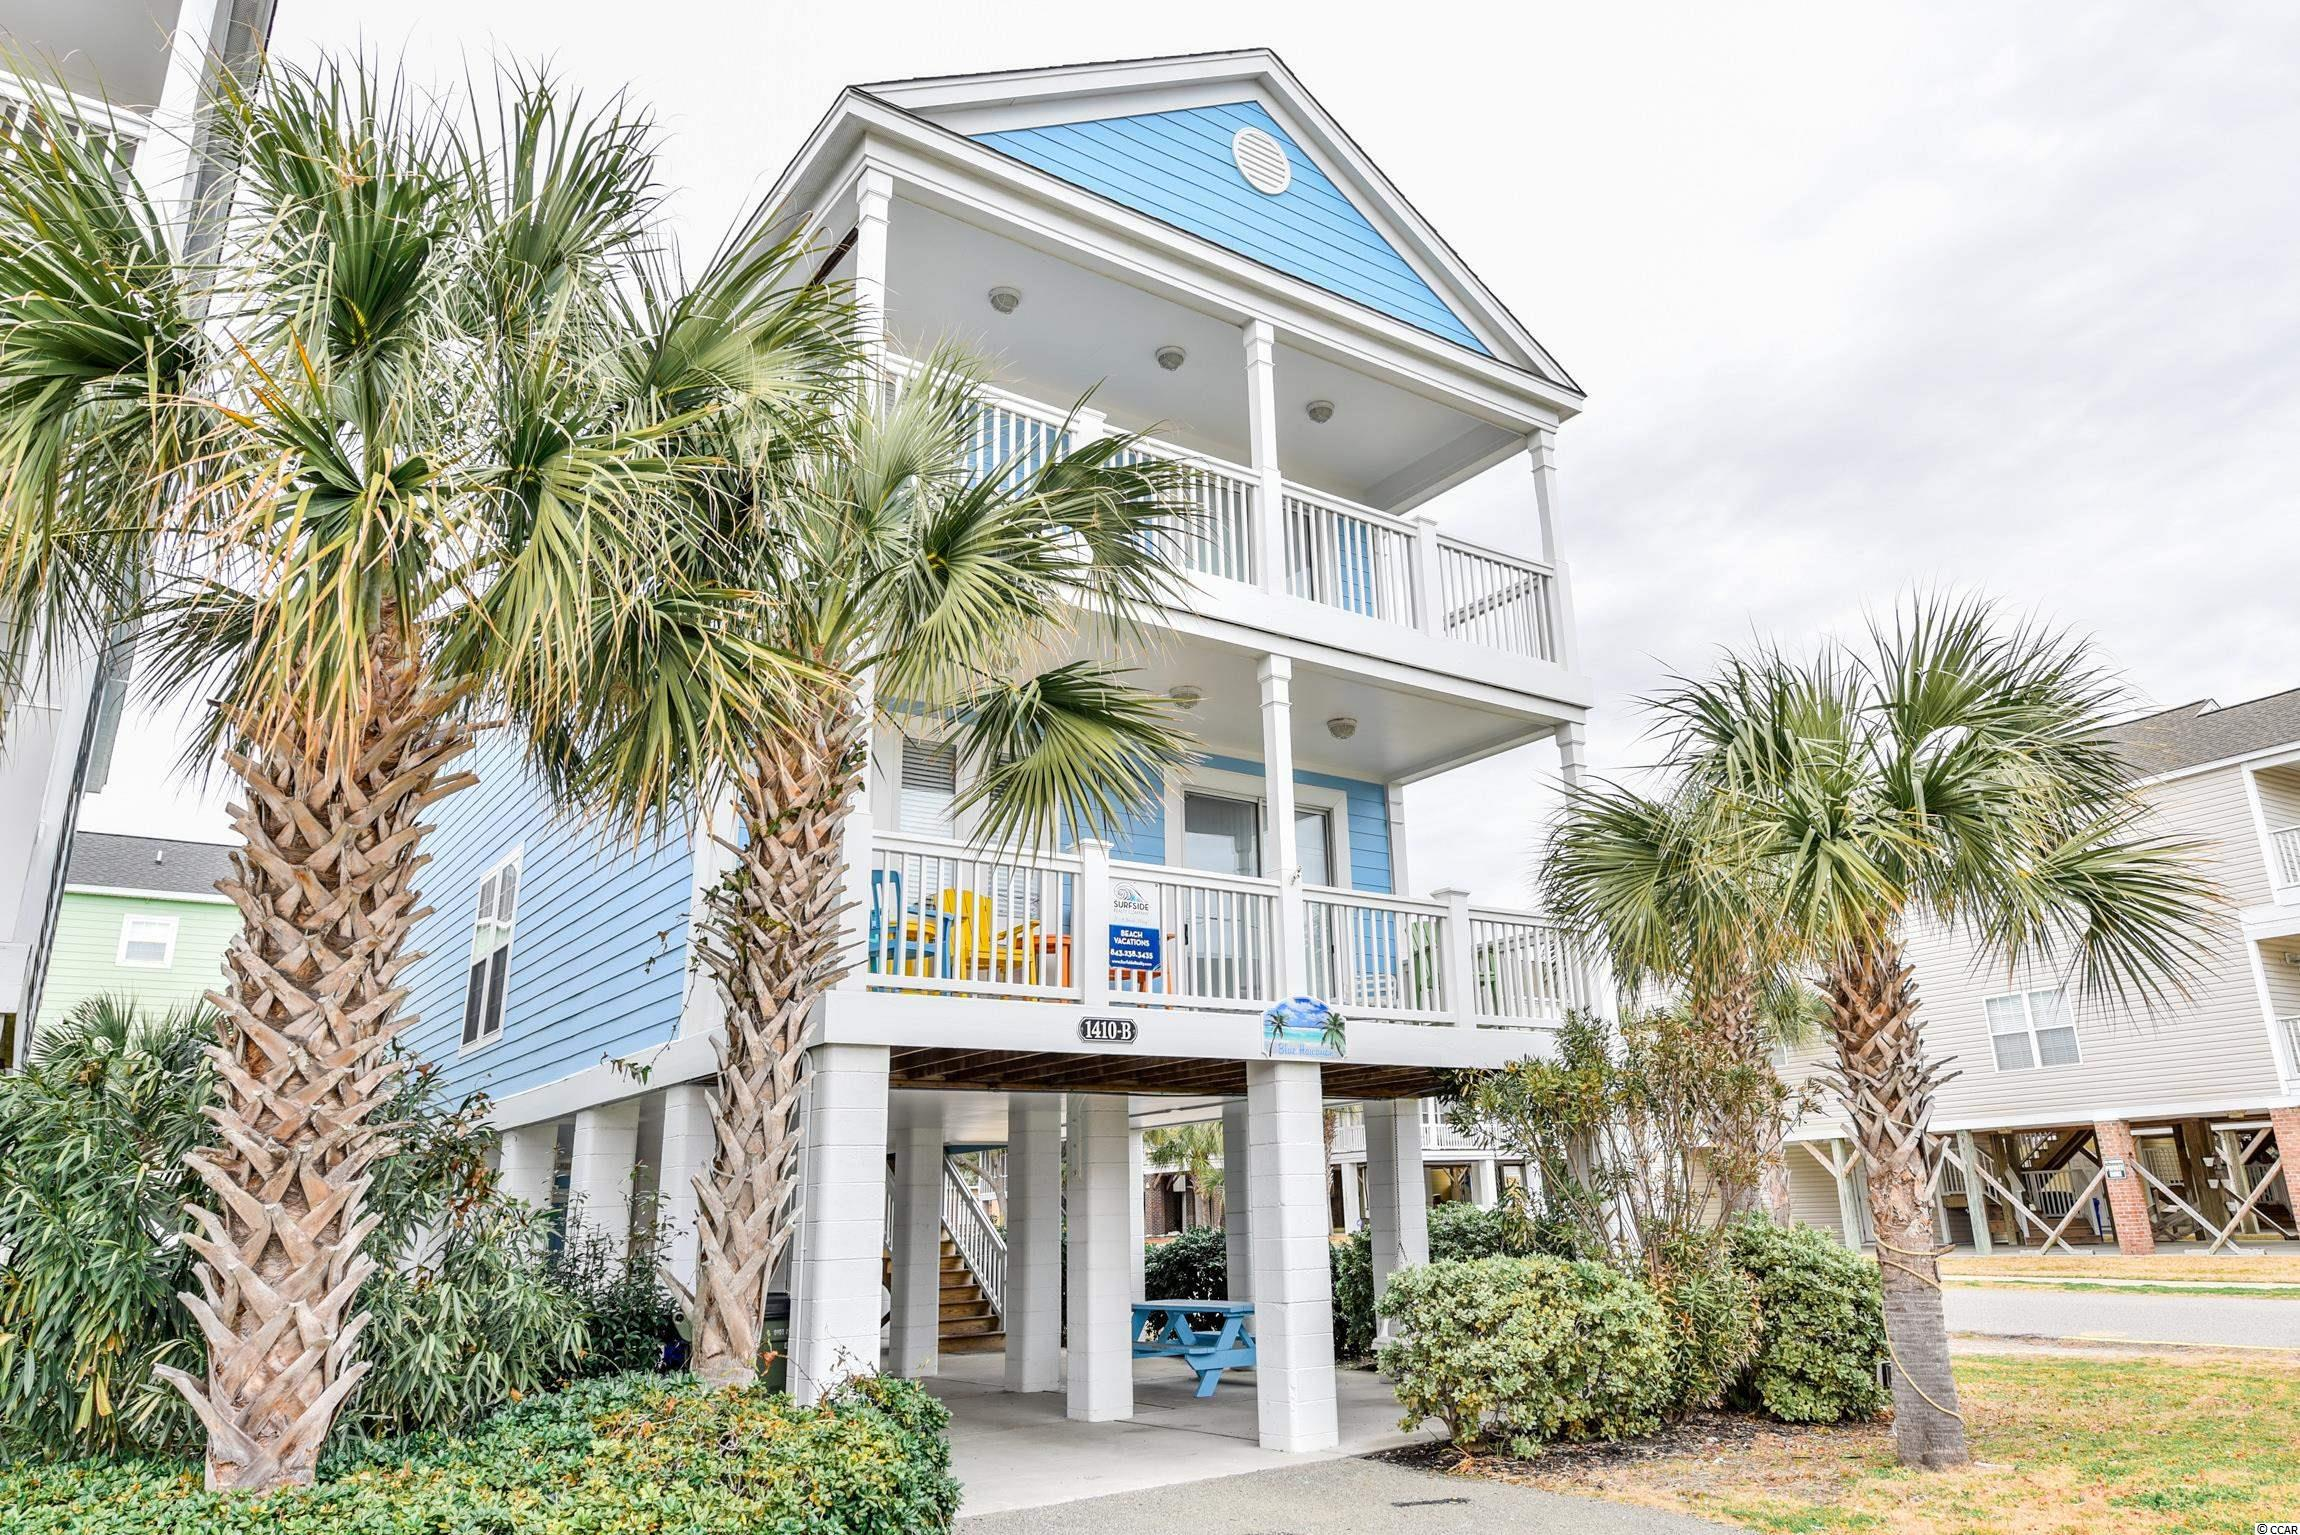 1410 B Ocean Blvd. S Property Photo 1